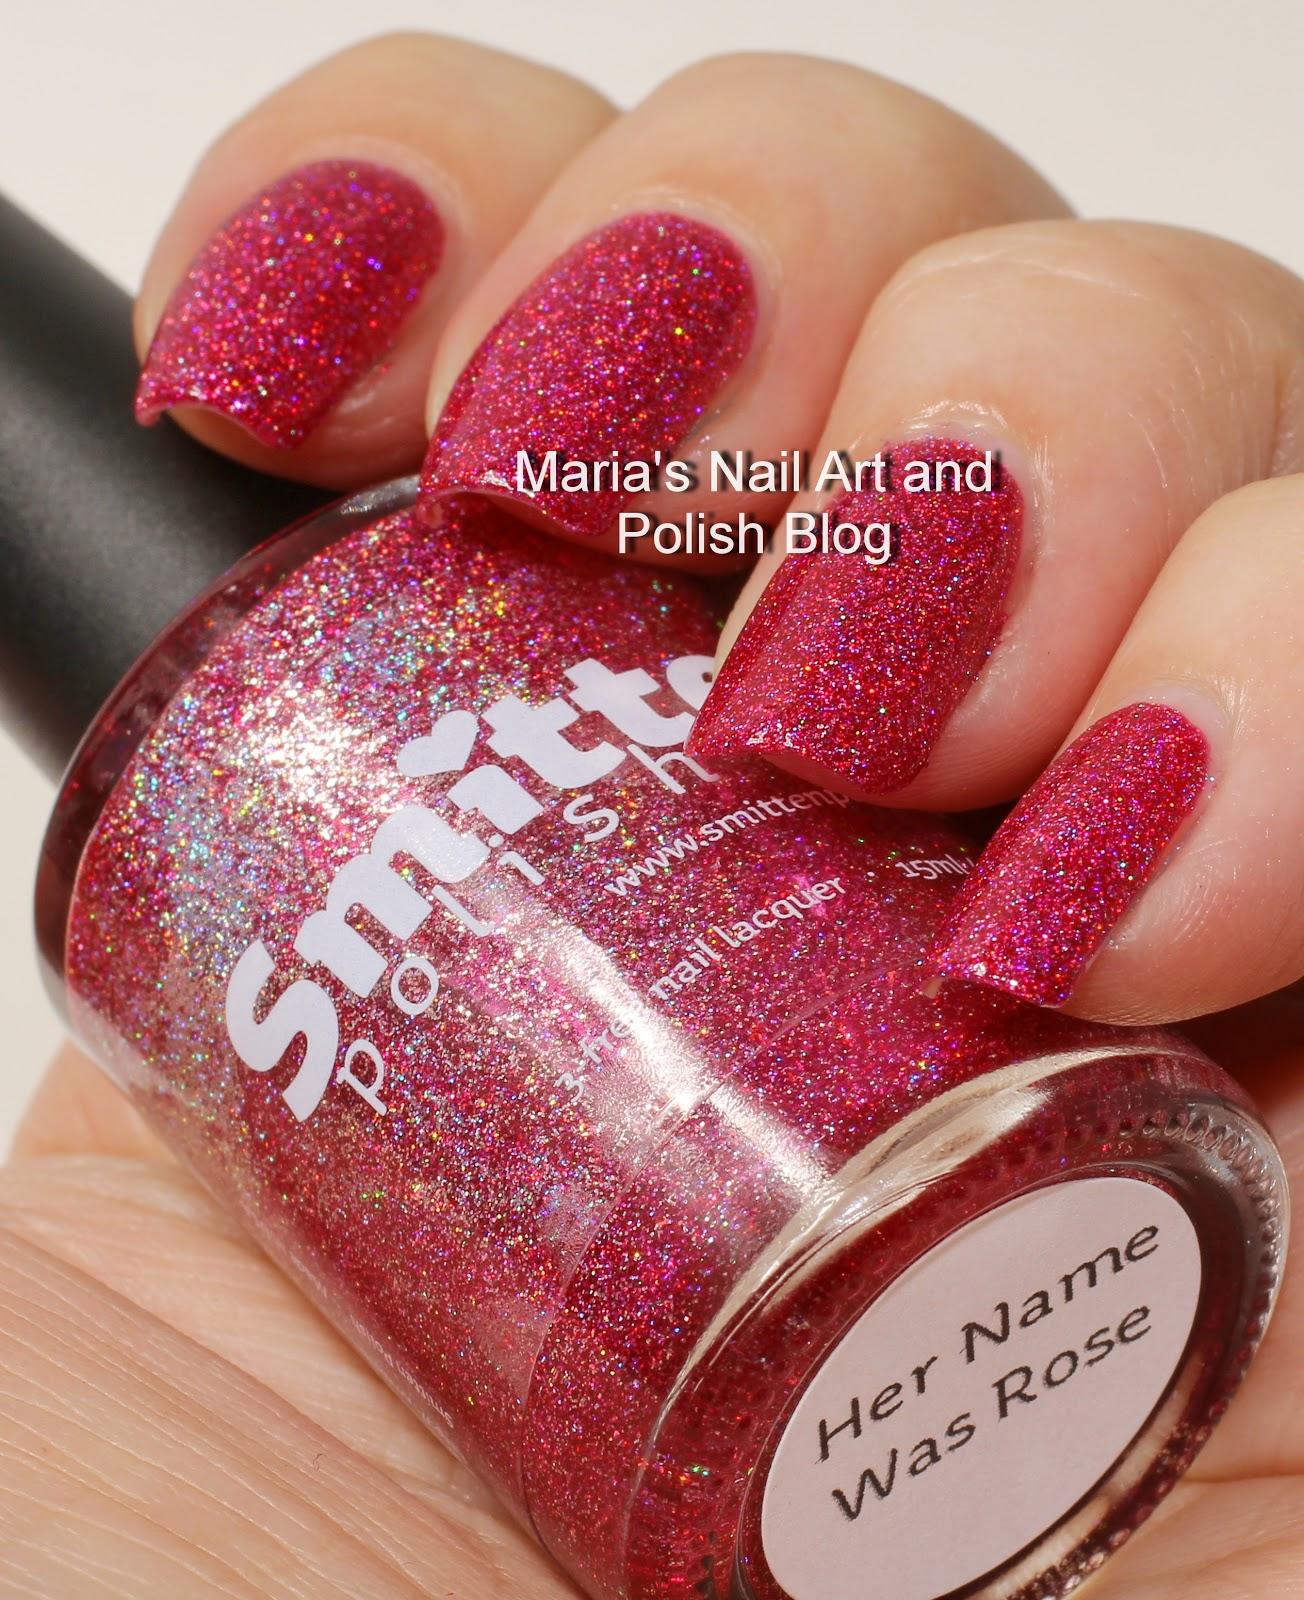 Marias Nail Art And Polish Blog Smitten Polish Her Name Was Rose